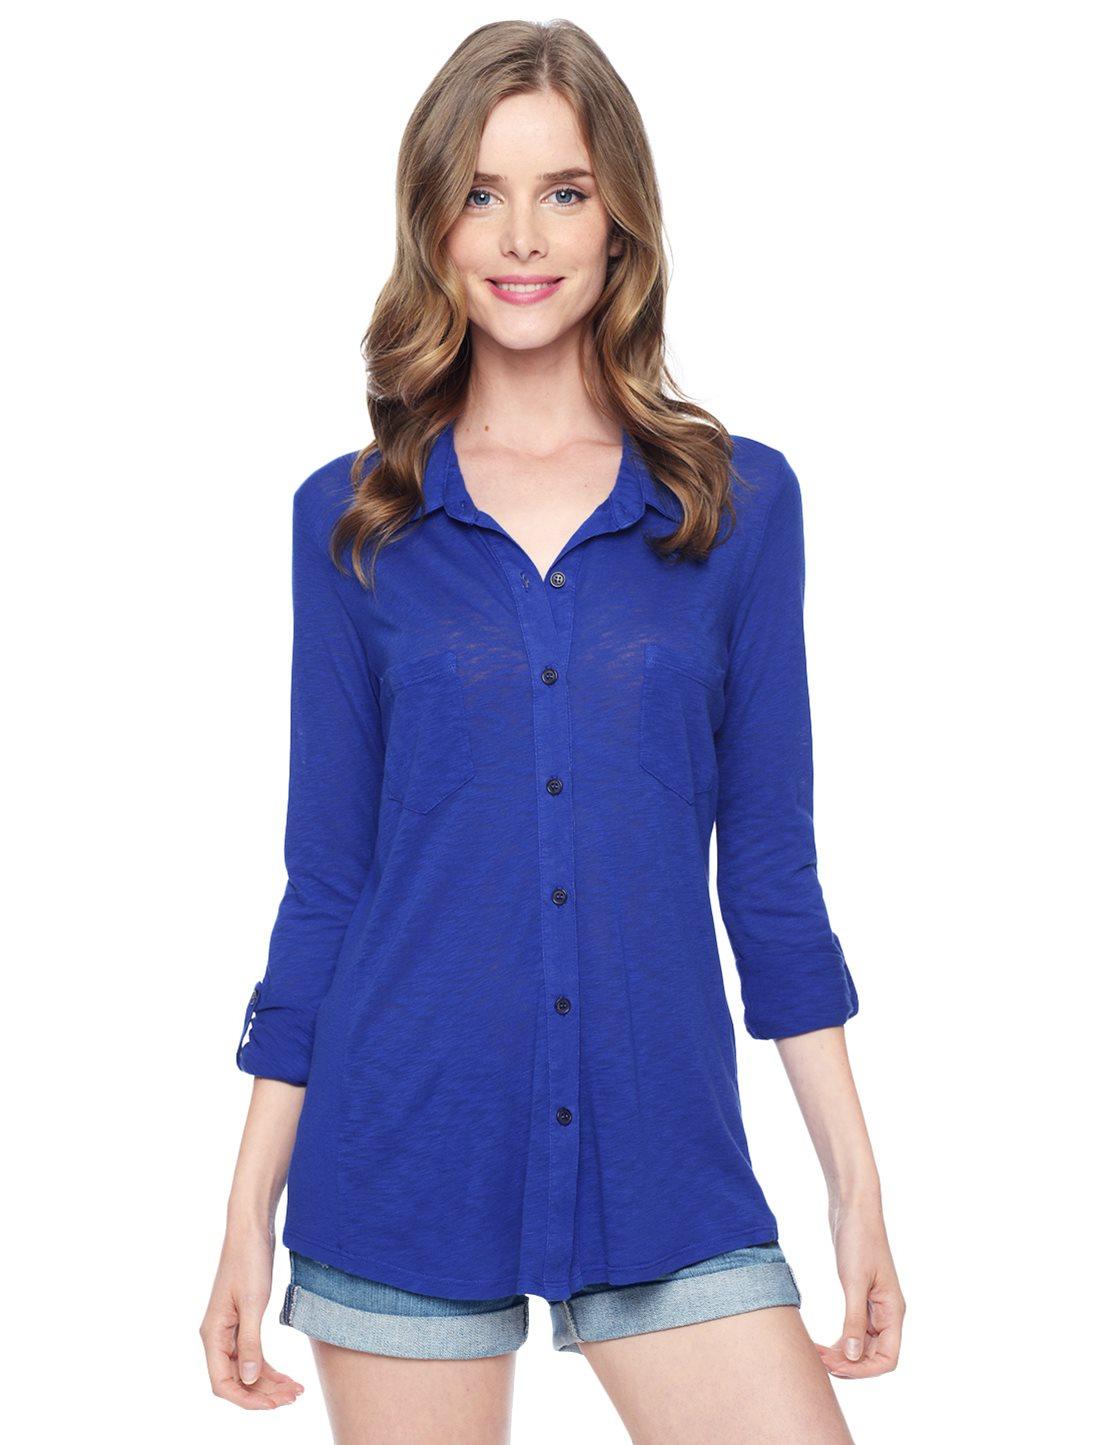 Splendid slub jersey knit shirt in blue cobalt blue lyst for What is a slub shirt